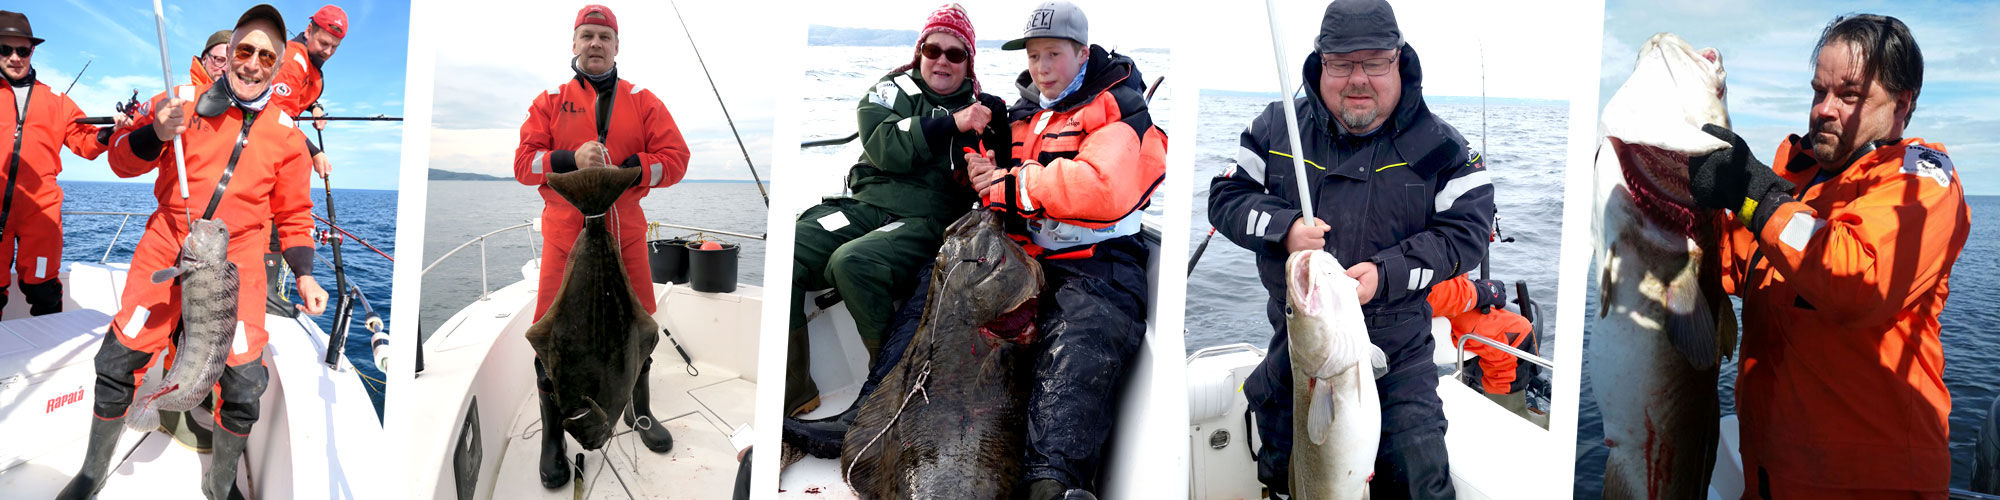 Jäämeren kalastus